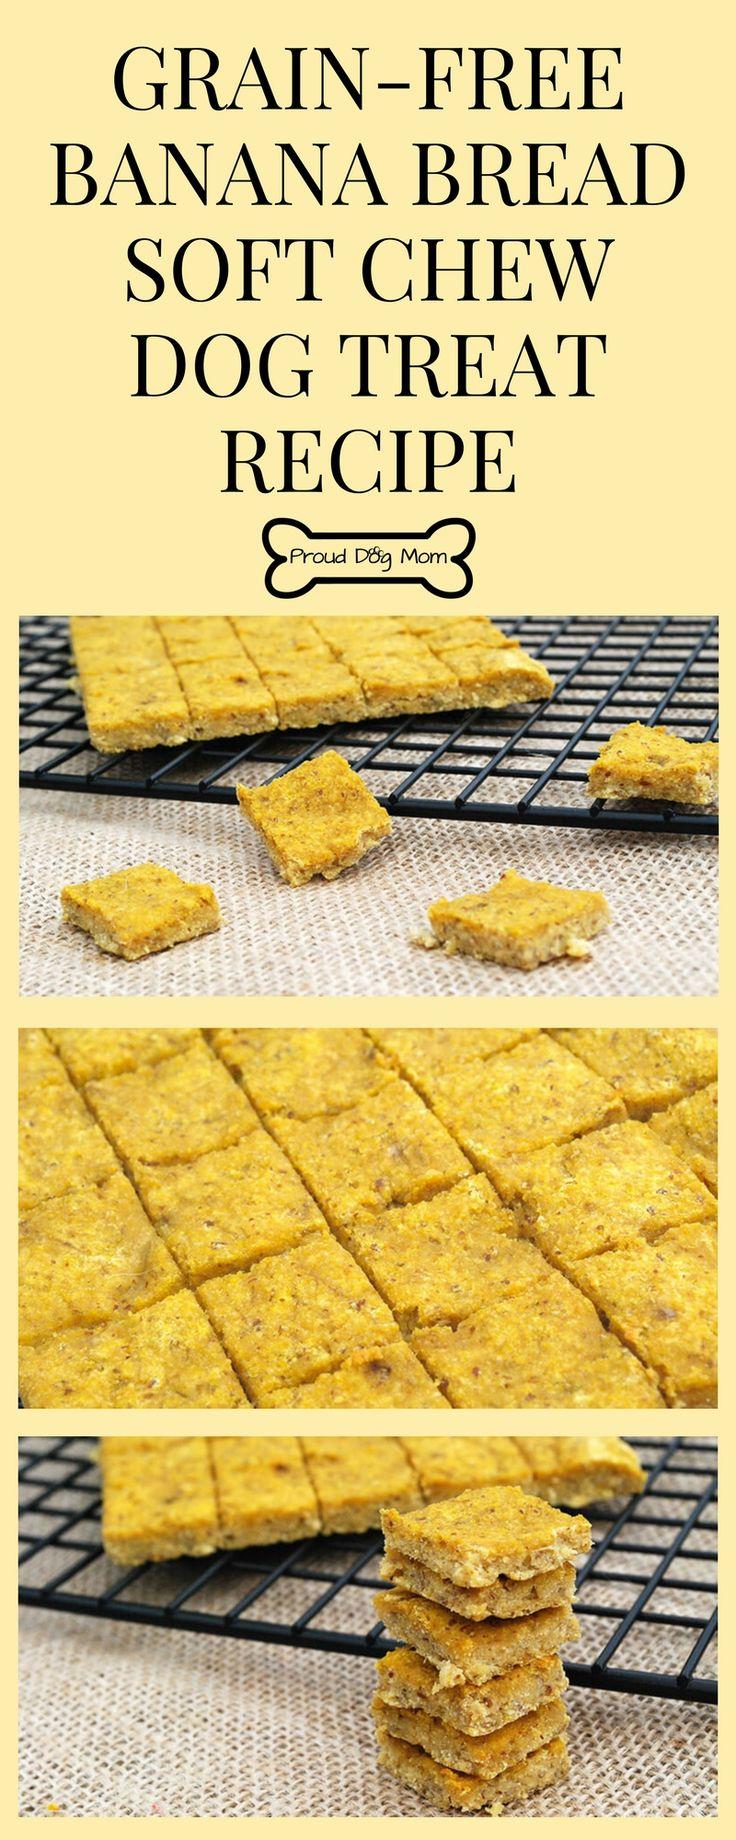 Banana Bread Soft Chew Dog Treat Recipe | Grain-Free Dog Treat Recipe | DIY Dog Treats | Homemade Dog Treat Recipe |